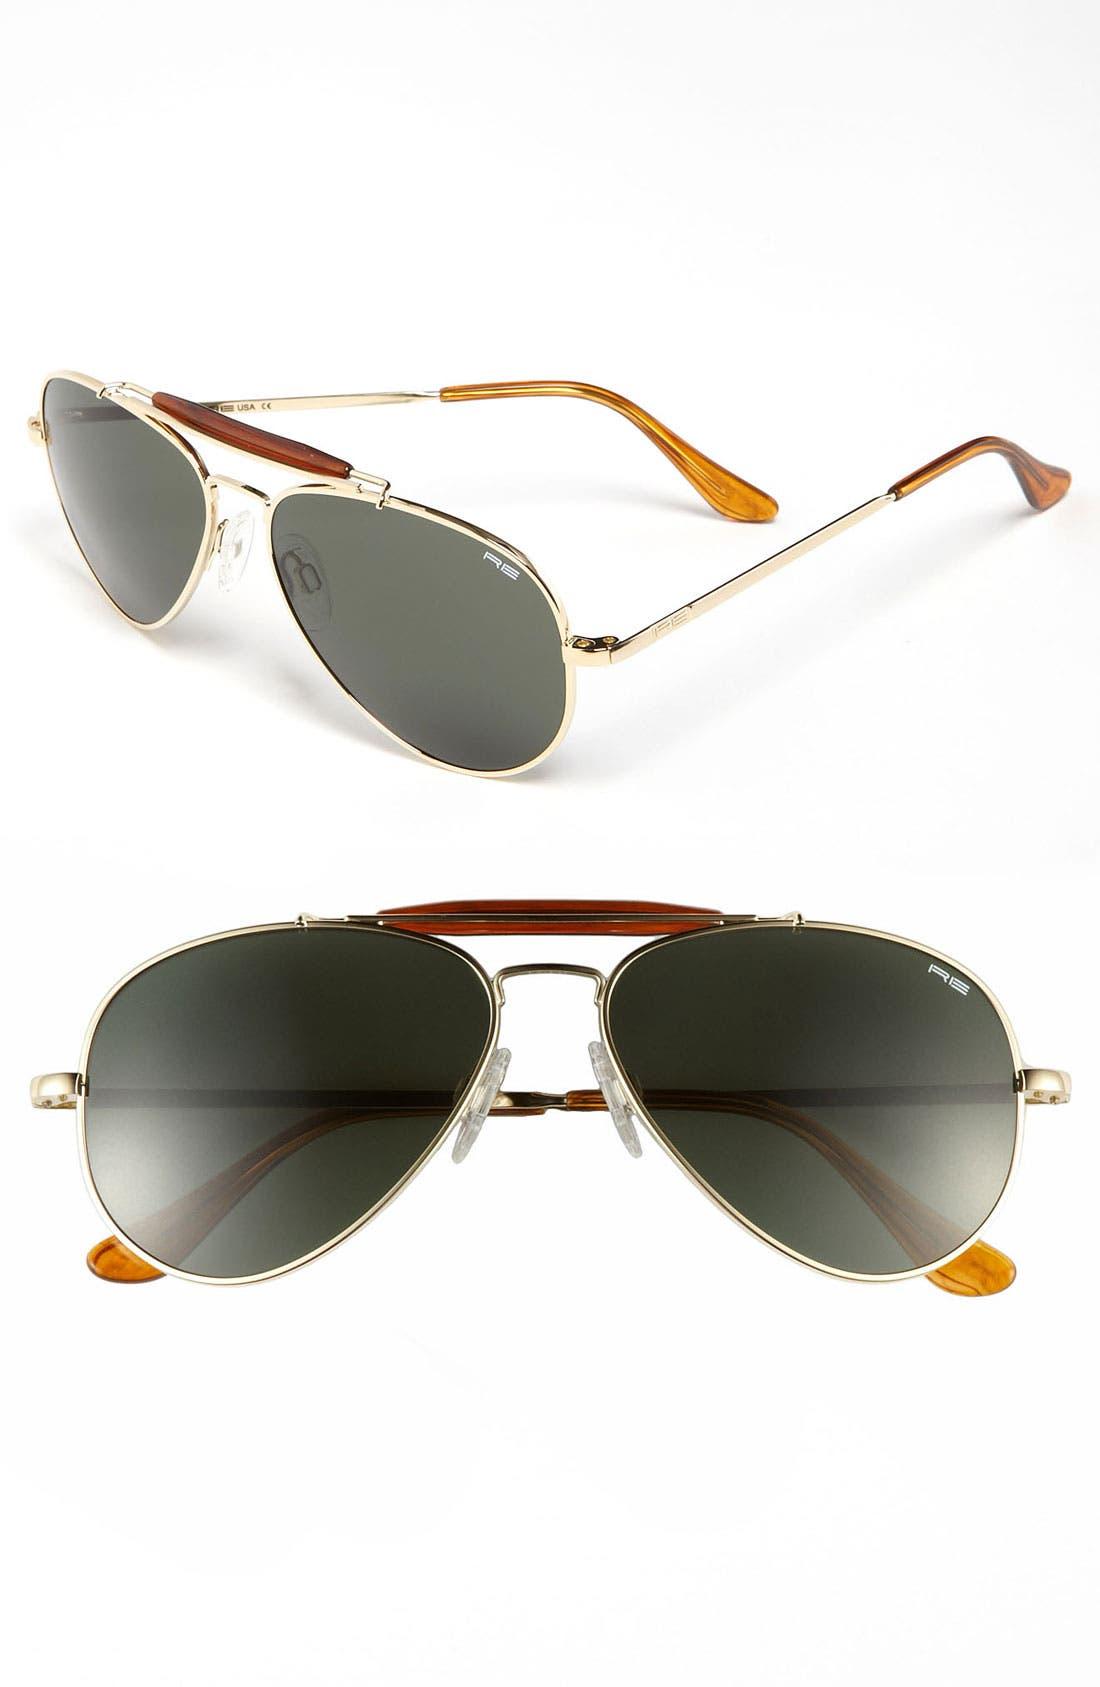 RANDOLPH ENGINEERING Sportsman 57mm Sunglasses